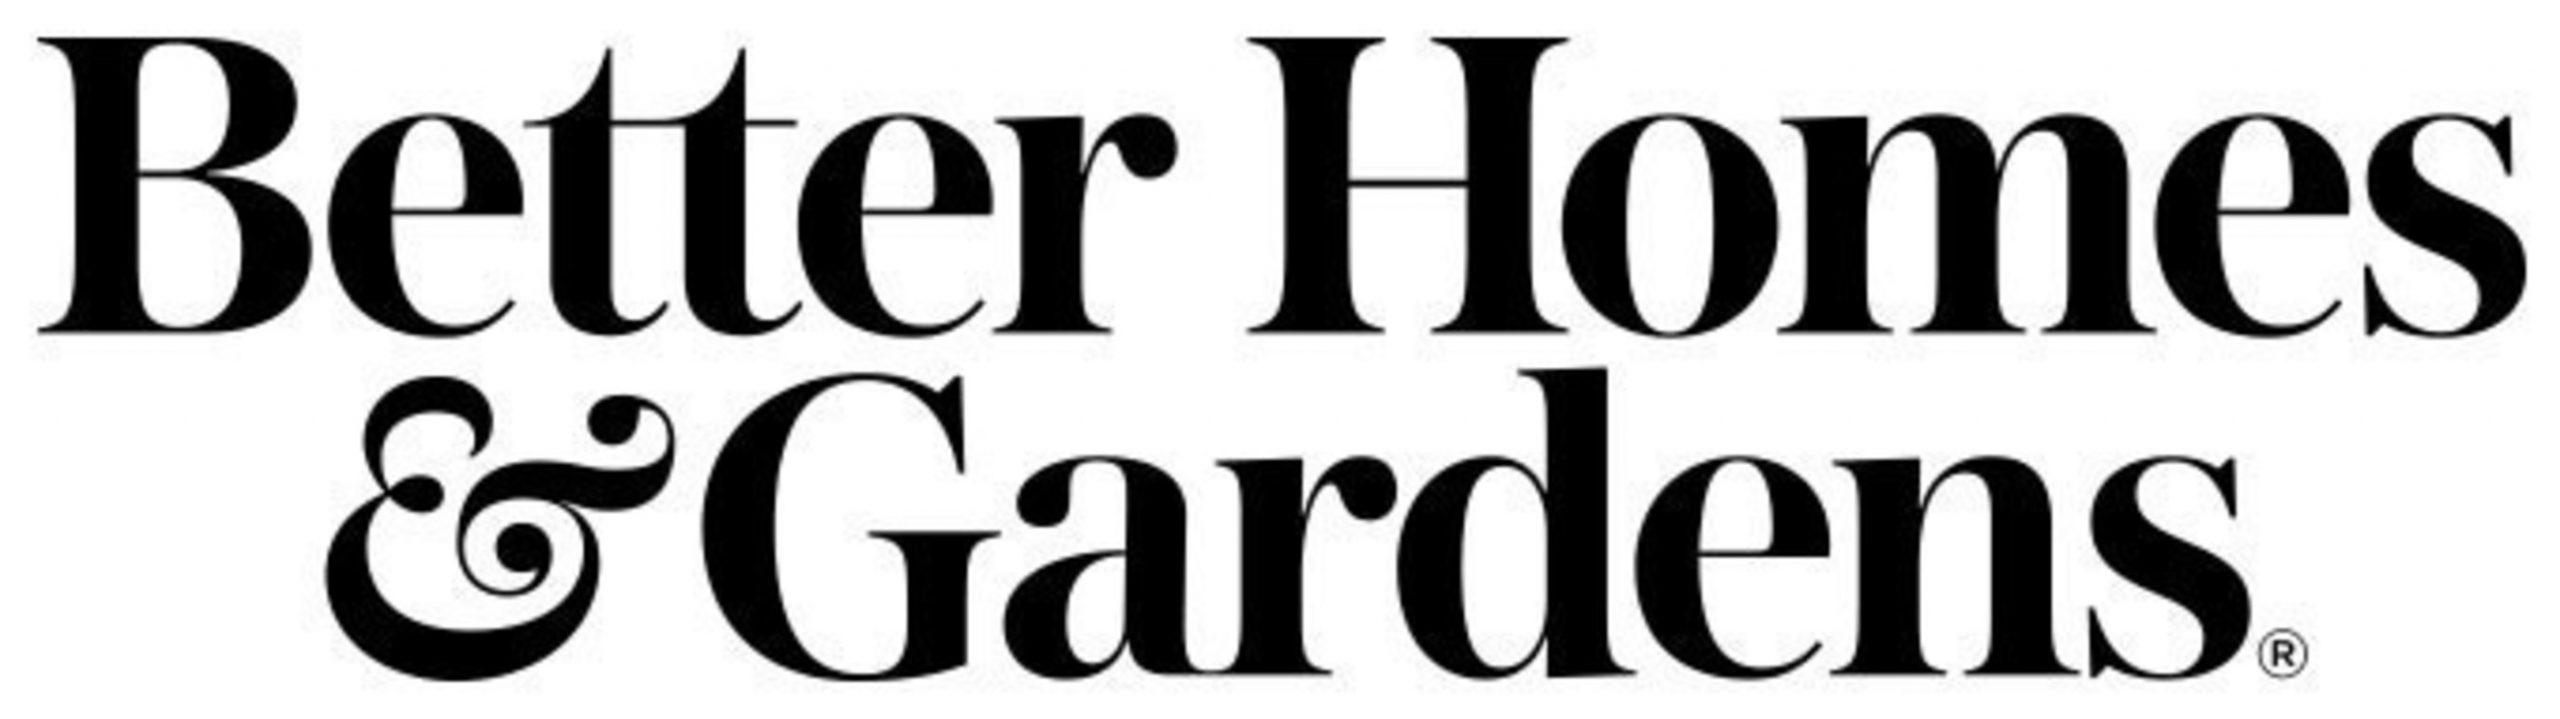 Better Home and Gardens logo